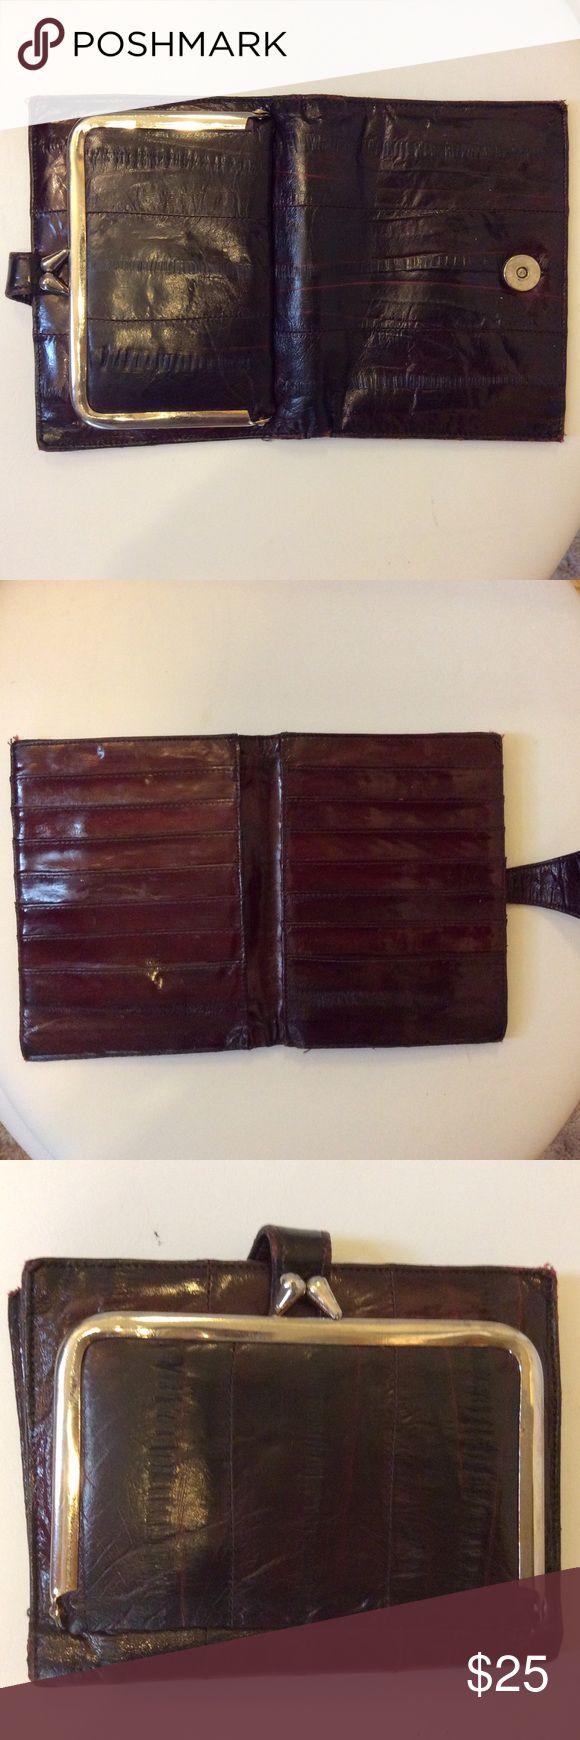 EEL SKIN WALLET Beautiful eel skin wallet holds 14 cards. Bags Wallets